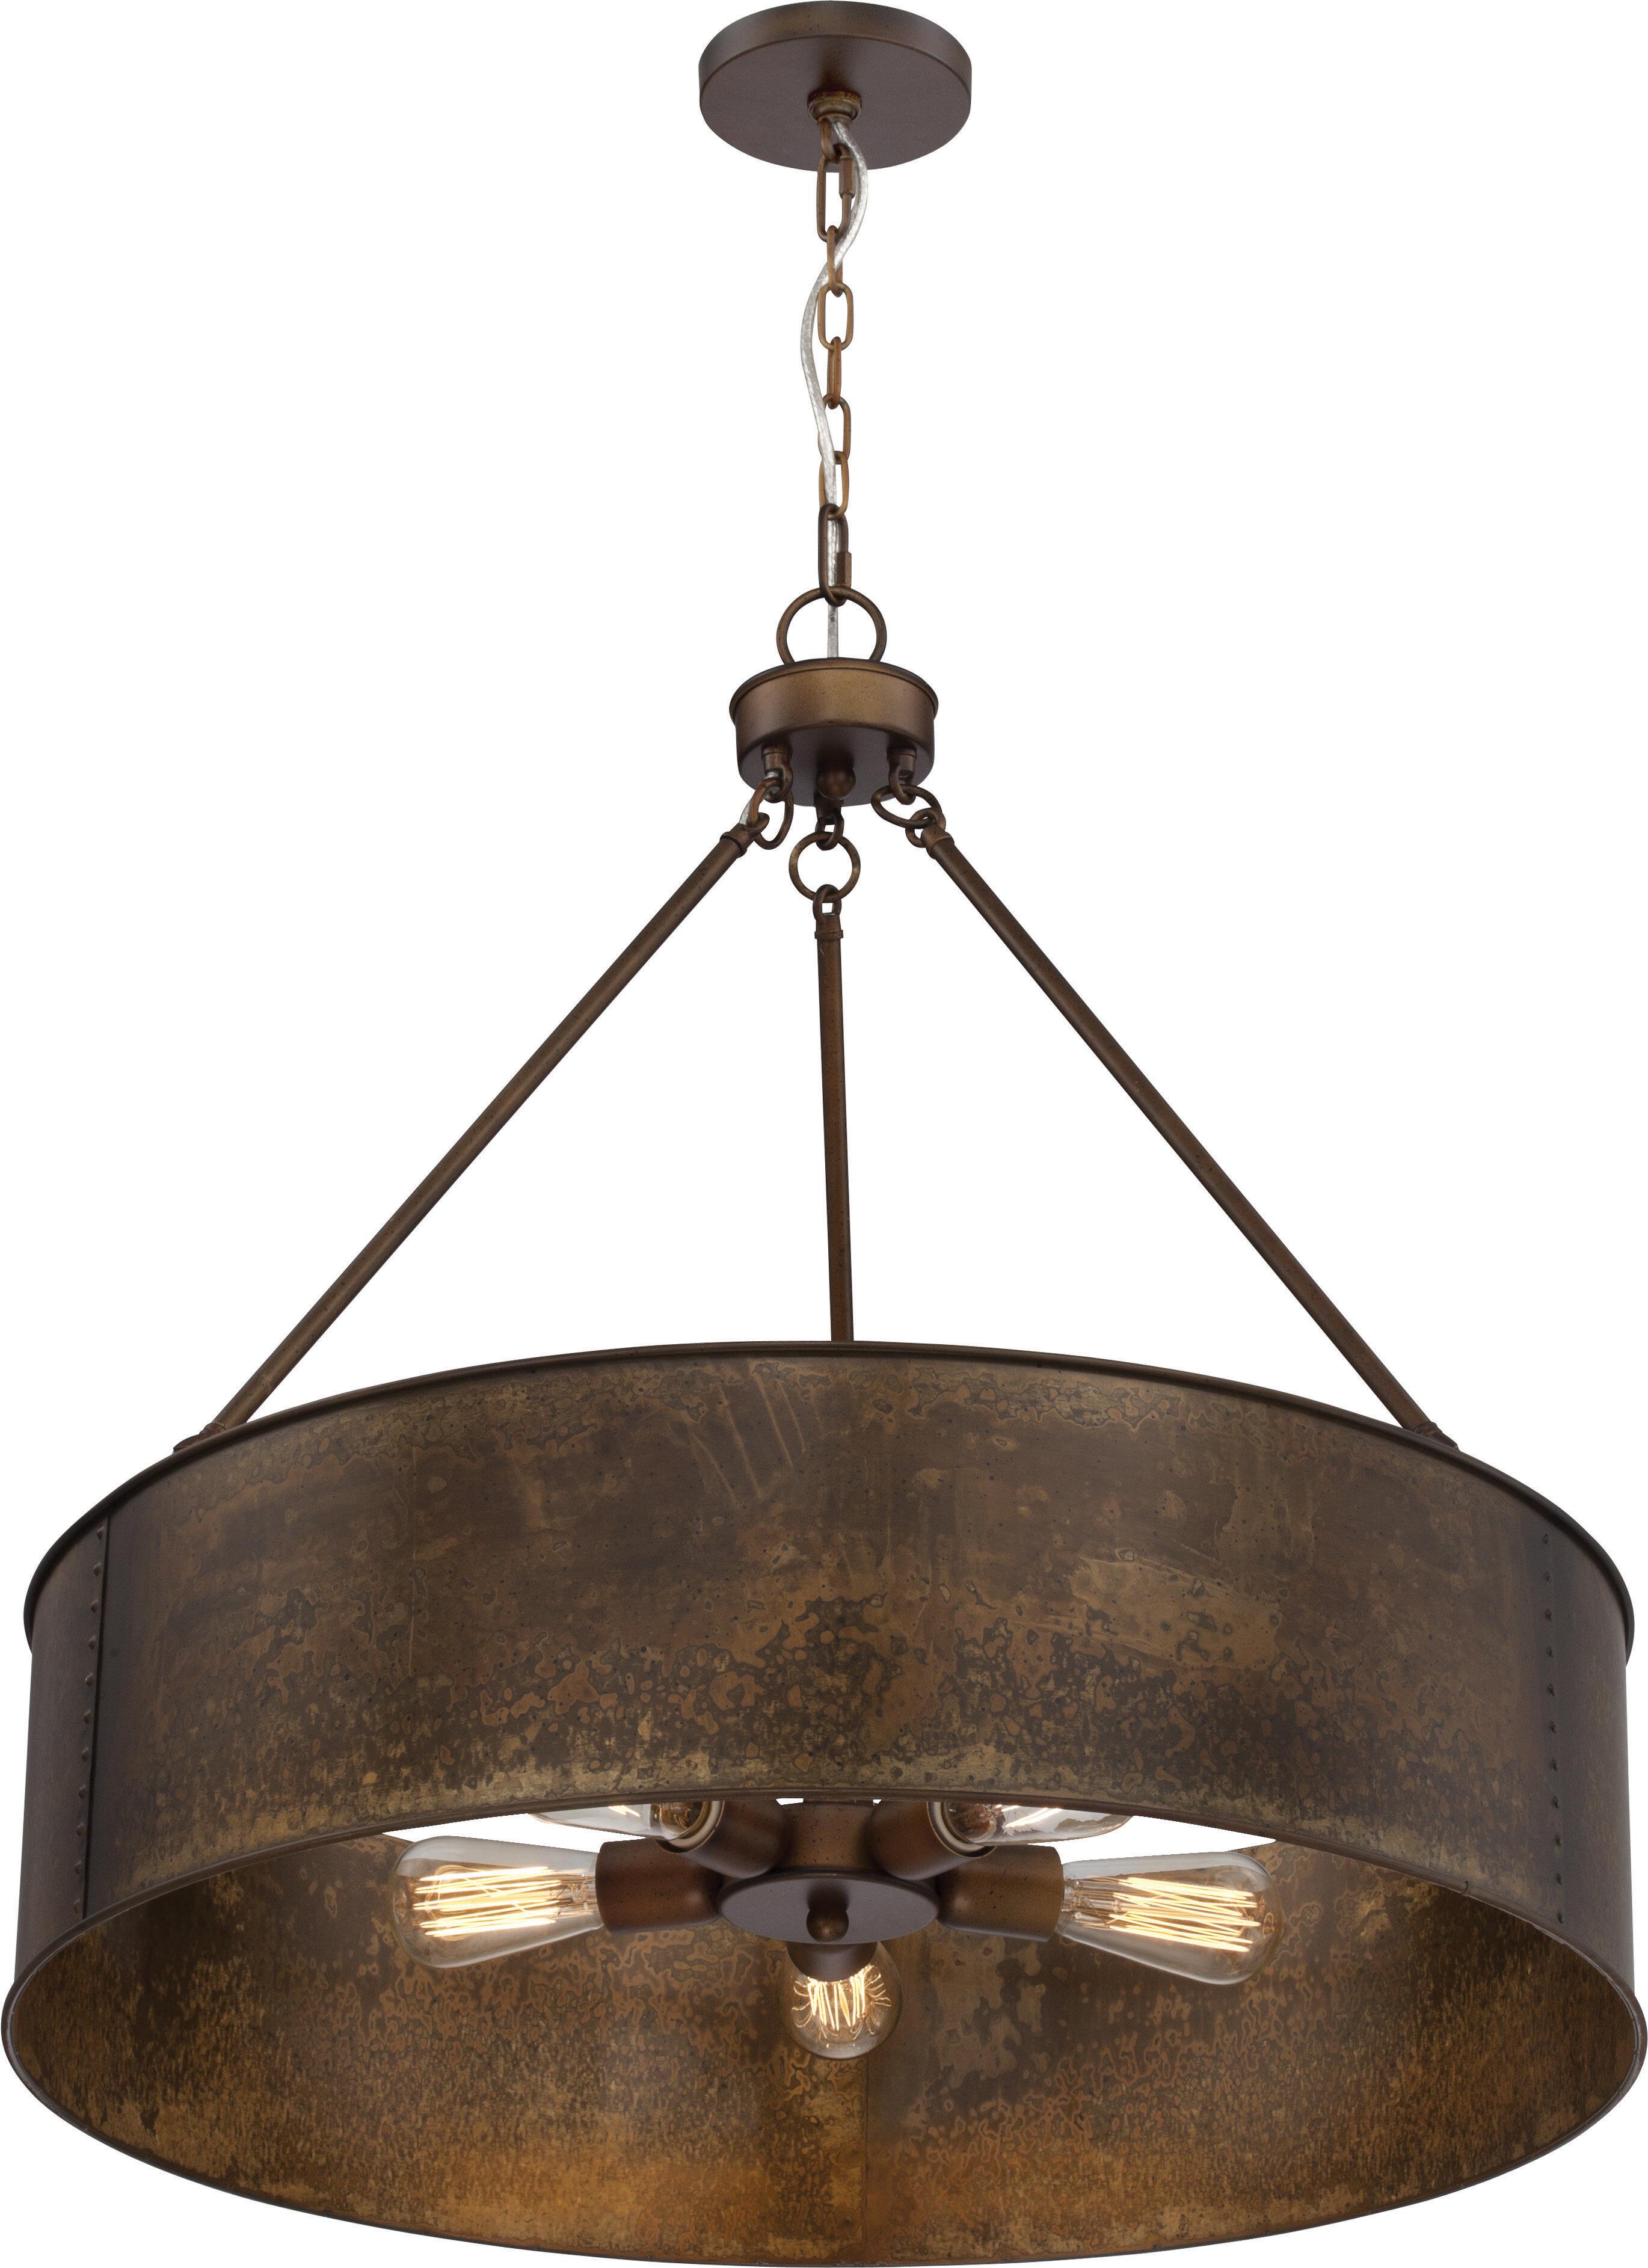 Farmhouse & Rustic Trent Austin Design Pendants | Birch Lane regarding Irwin 1-Light Single Globe Pendants (Image 10 of 30)